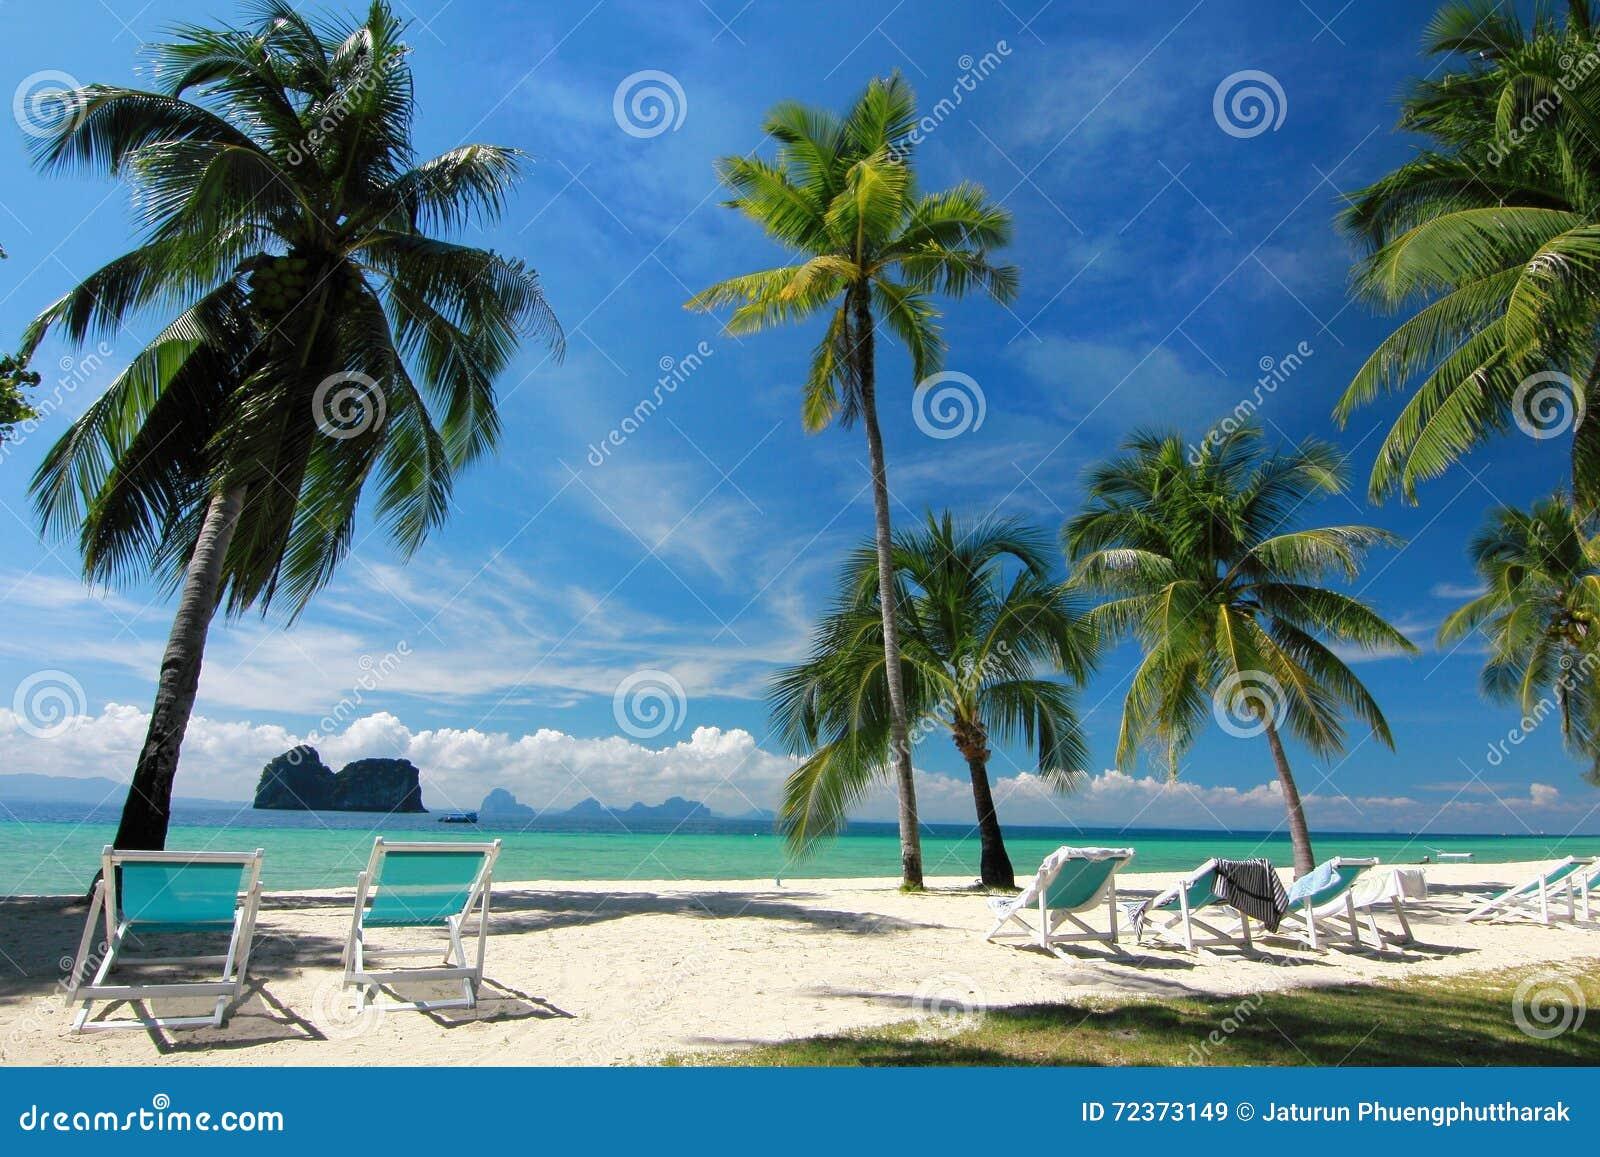 Trang的泰国天堂海岛